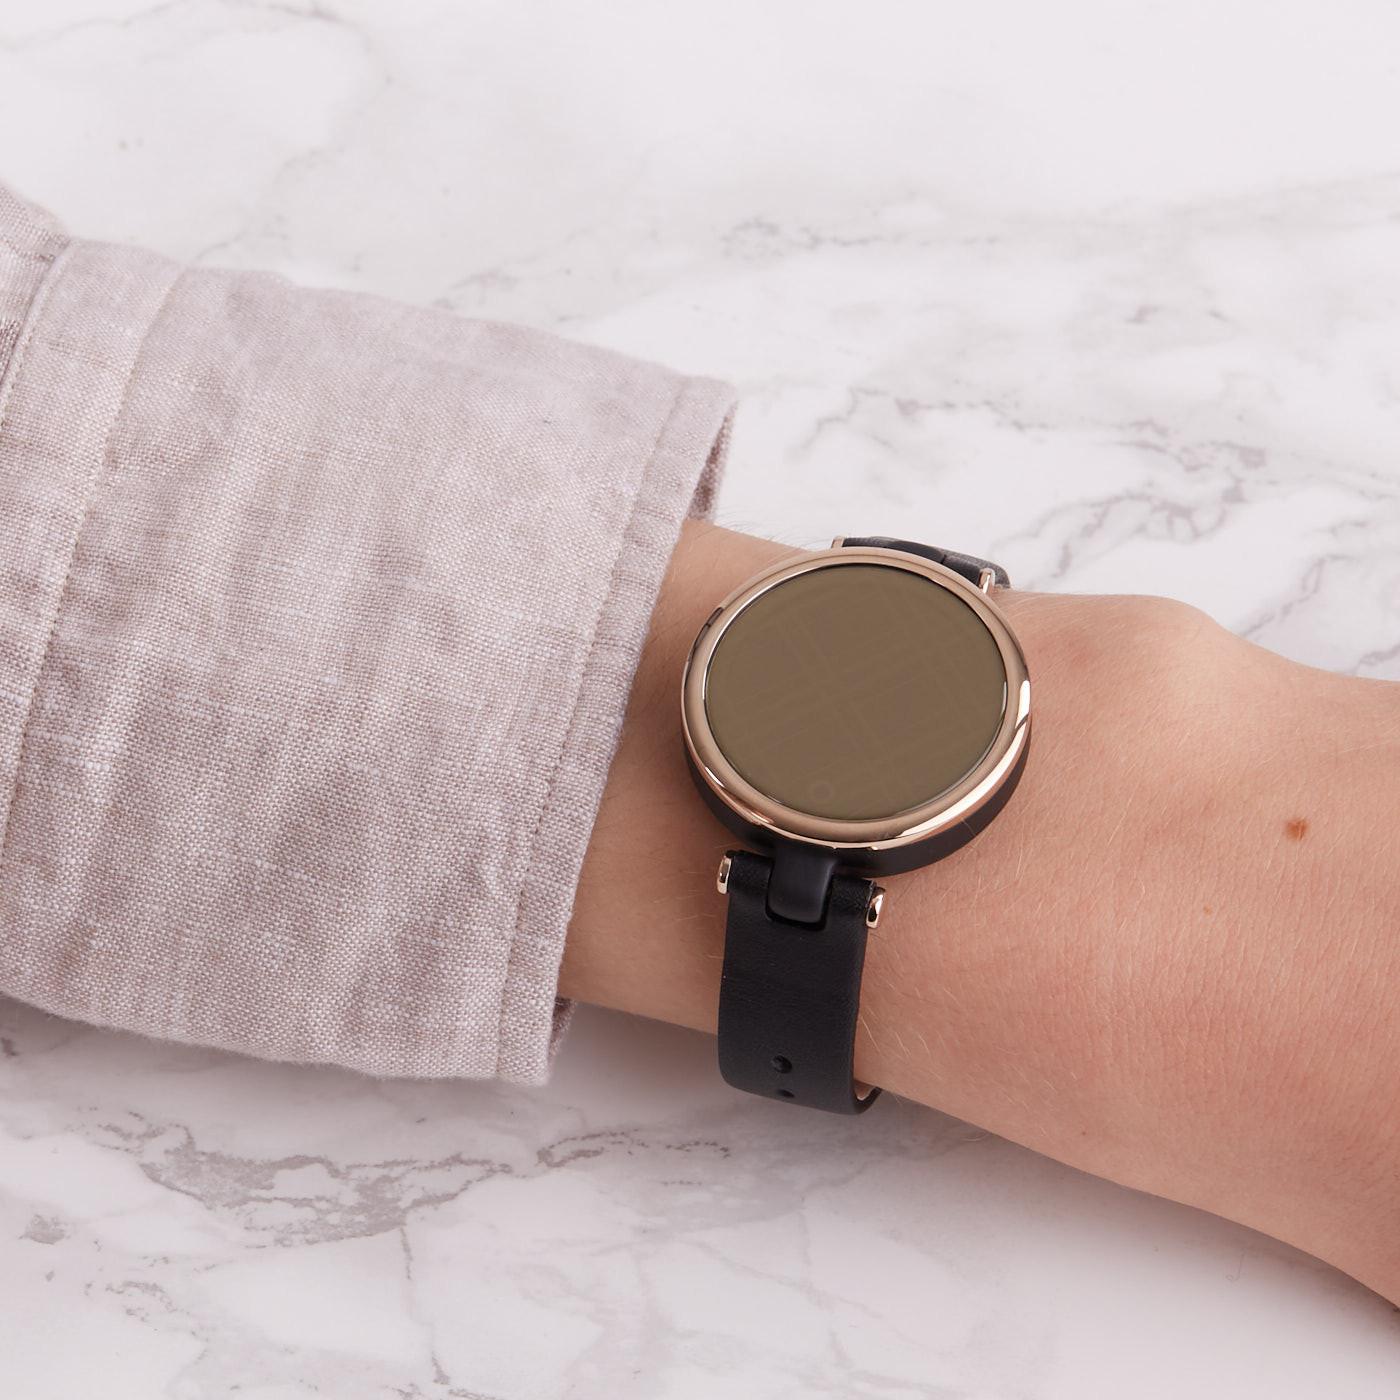 Garmin Lily Classic Display Smartwatch 010-02384-B1